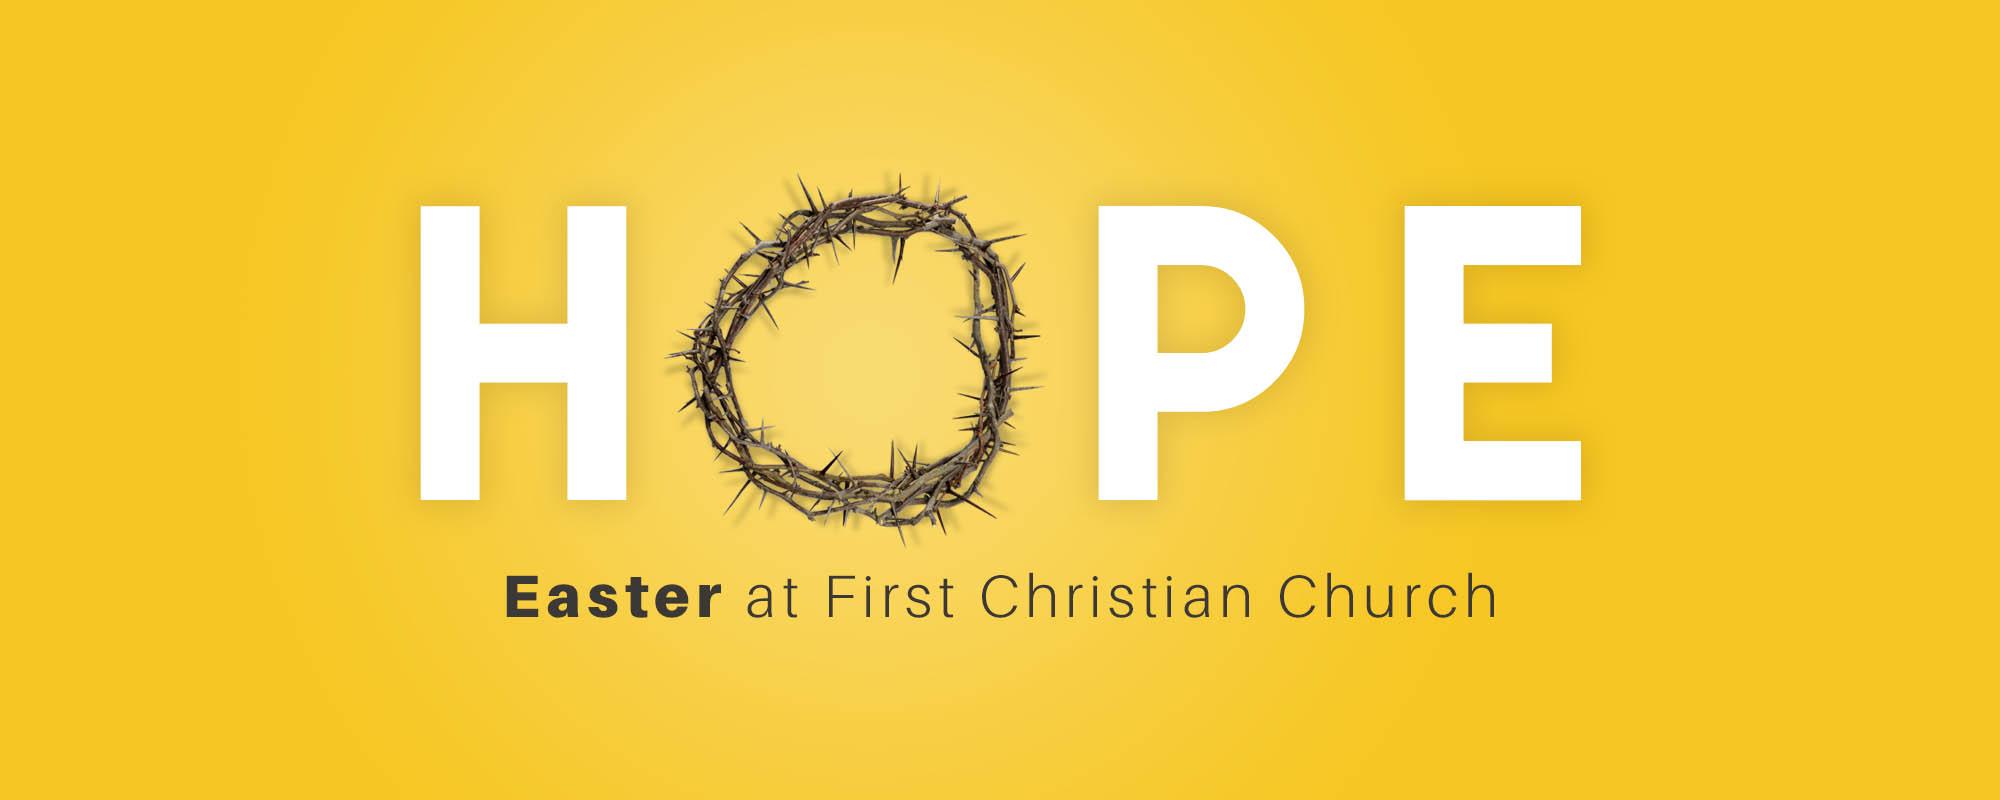 Easter 2017 - Web Banner